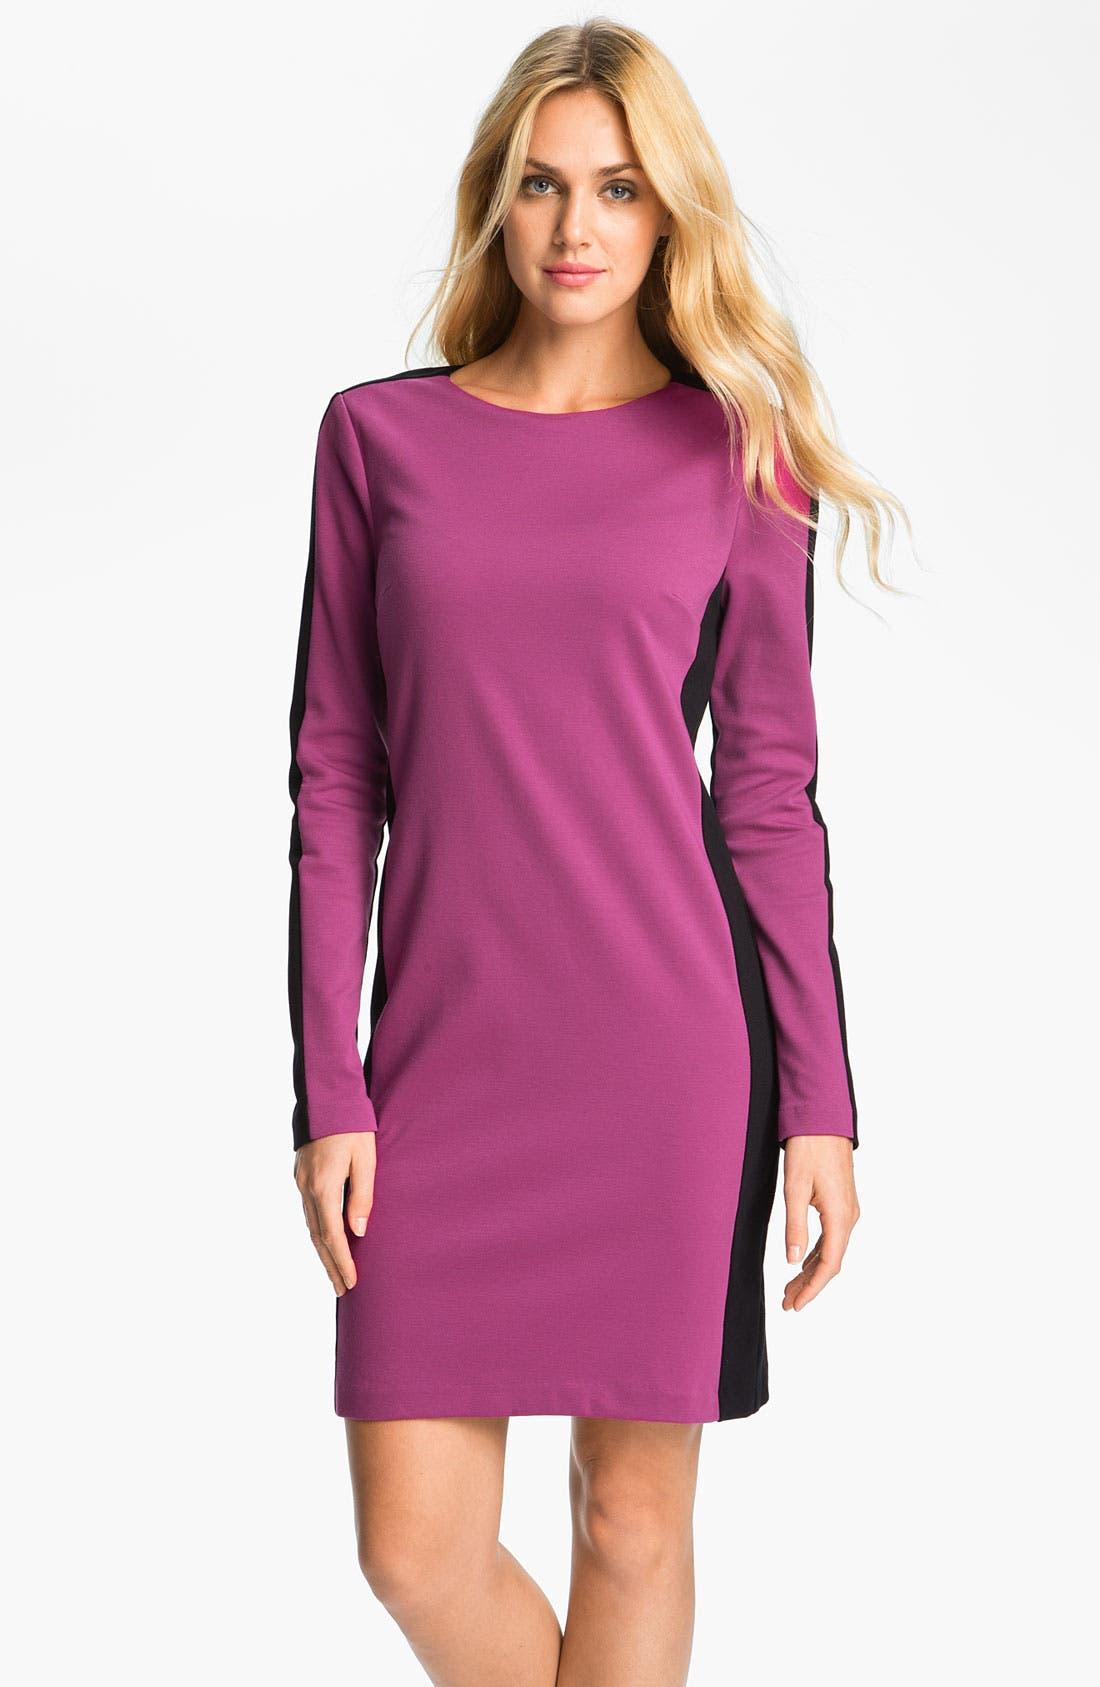 Alternate Image 1 Selected - MICHAEL Michael Kors Colorblock Knit Shift Dress